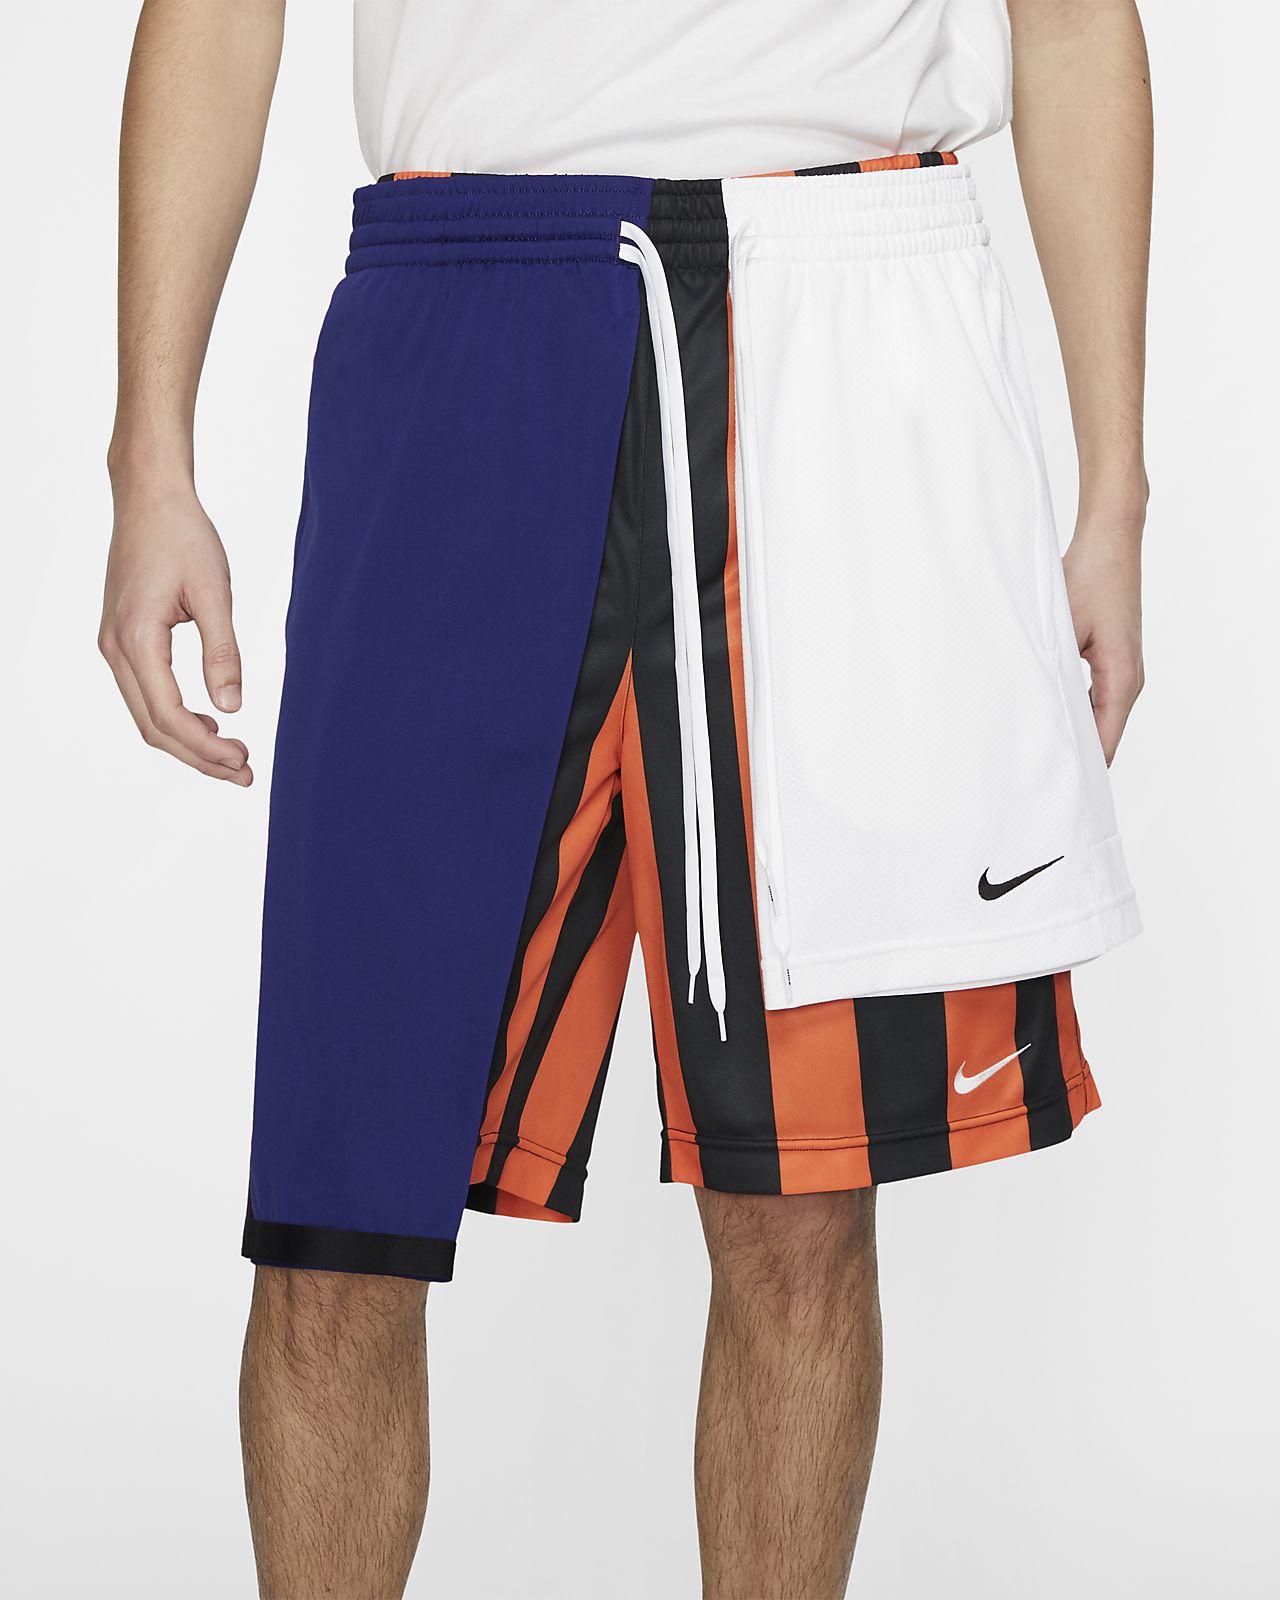 NikeLab Collection Men's Shorts